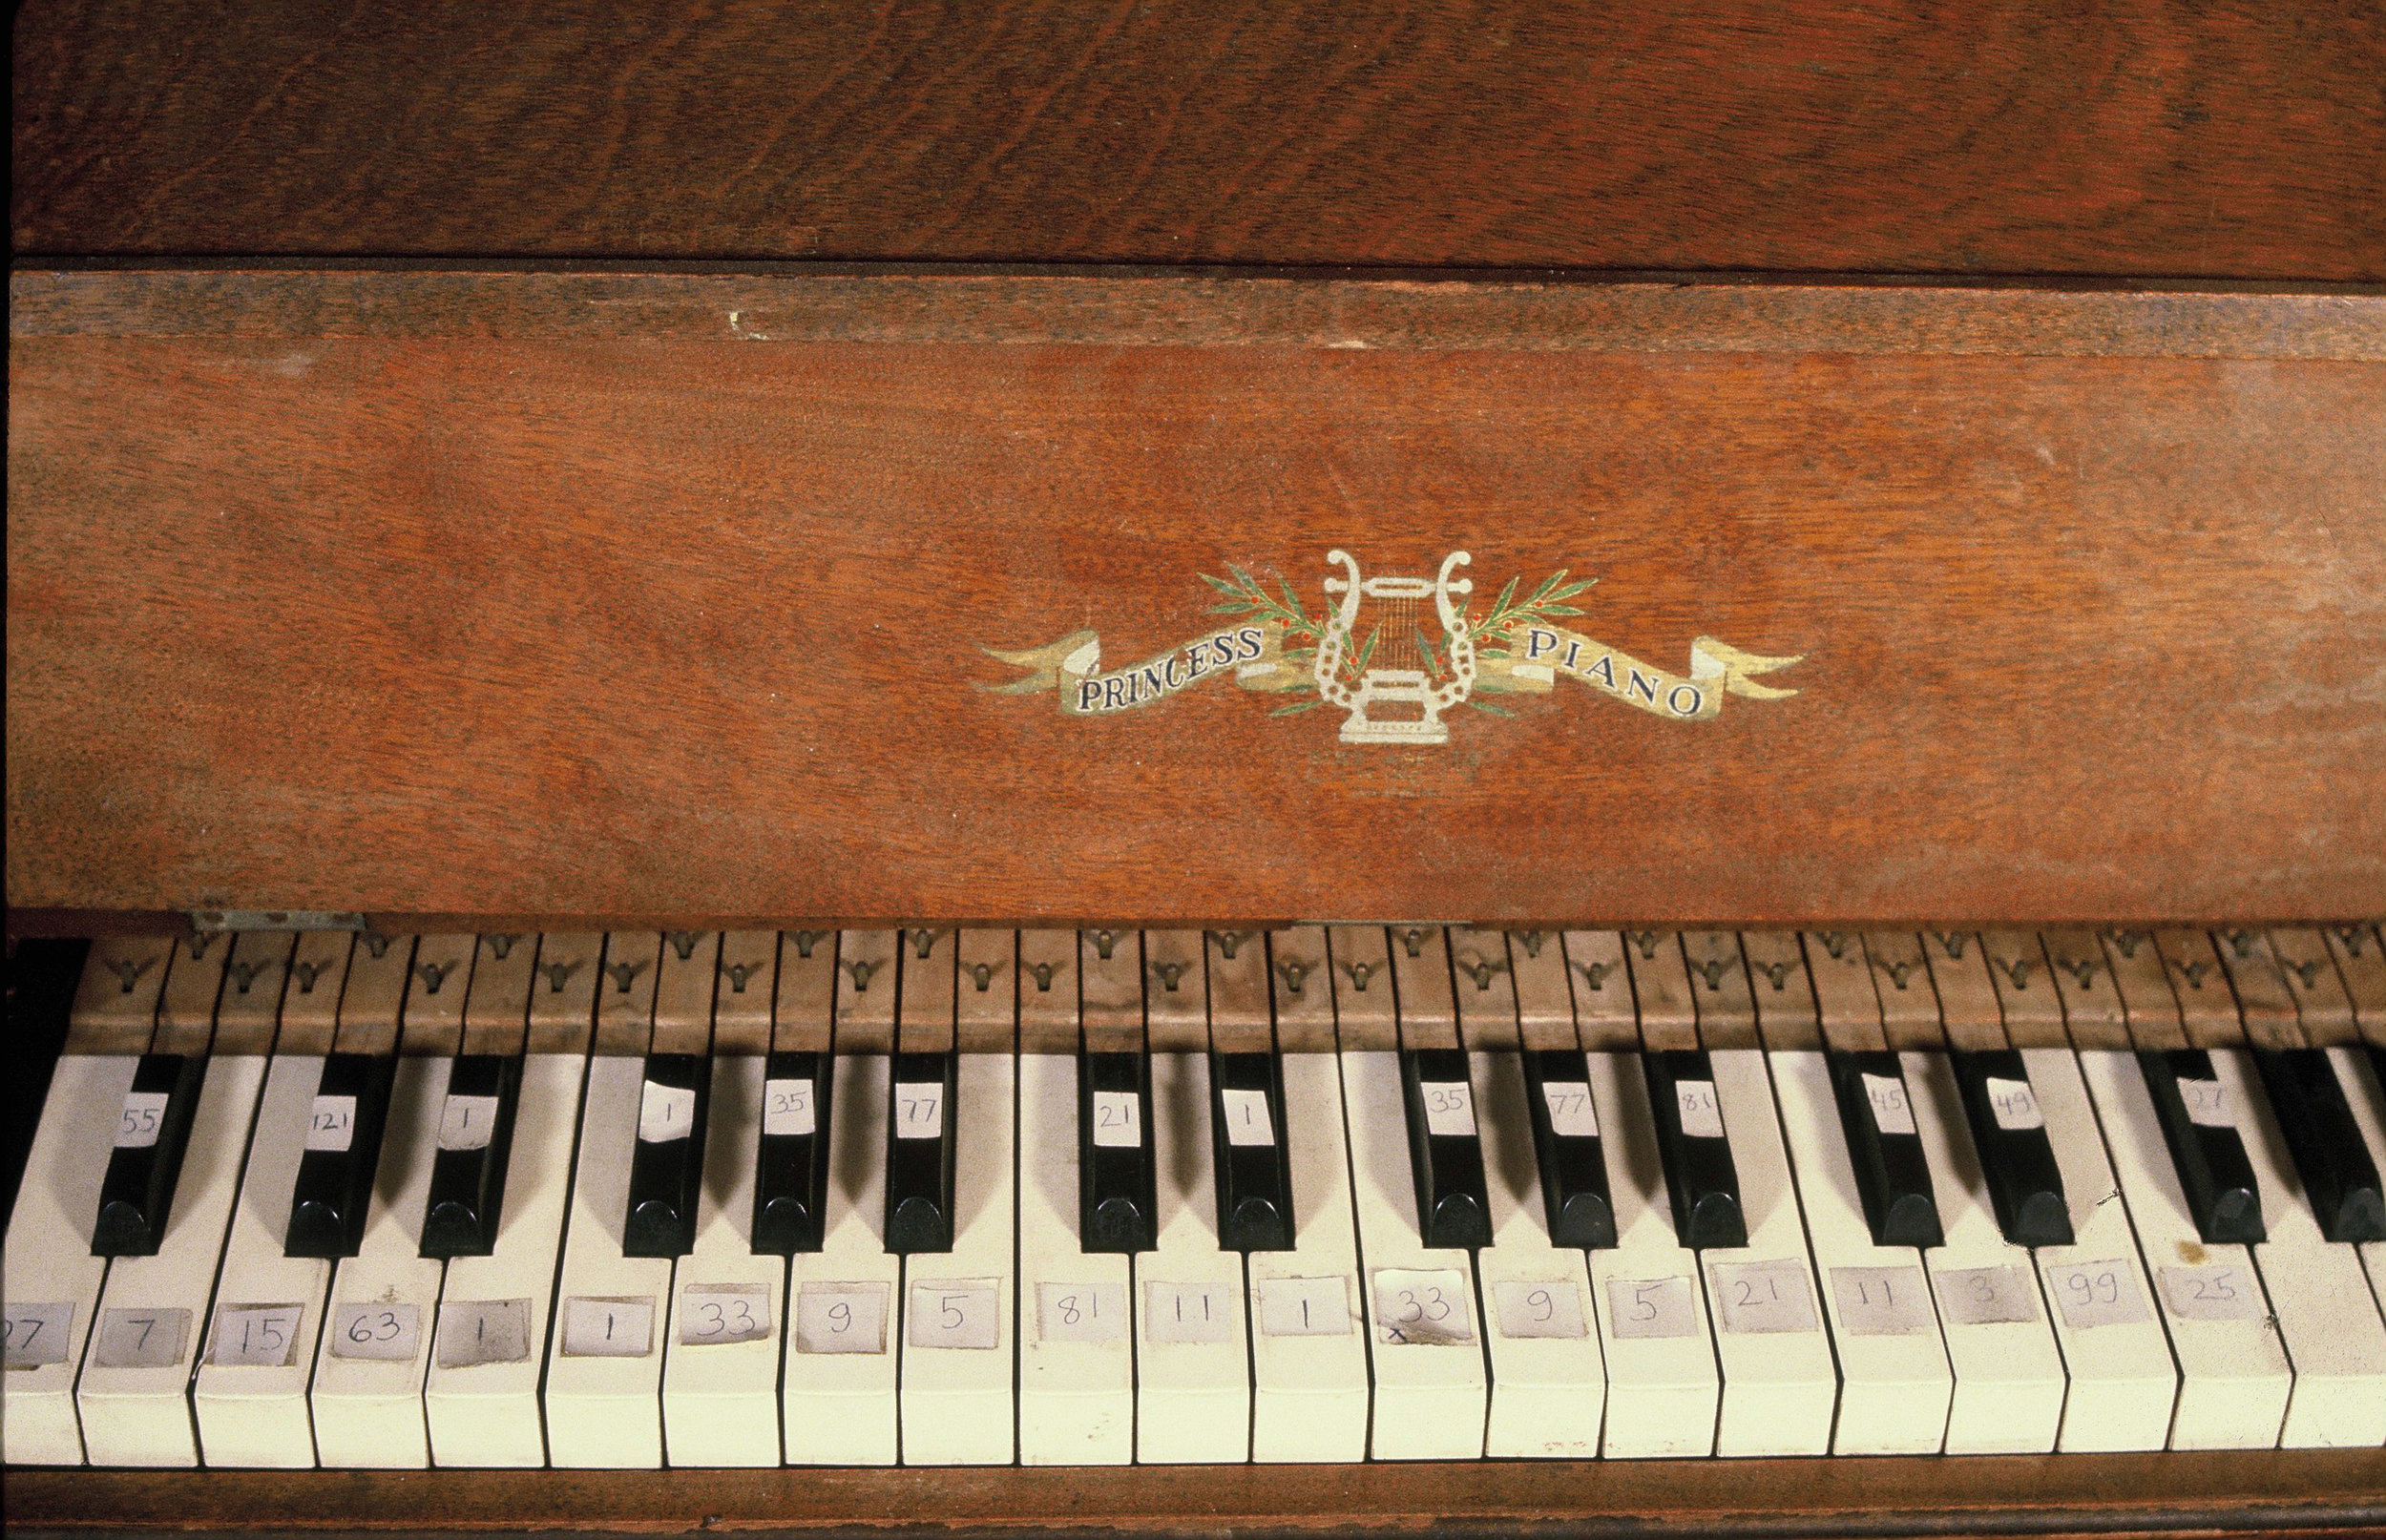 Miniature Pianoforte keyboard, Fulton Street Studio, 1978